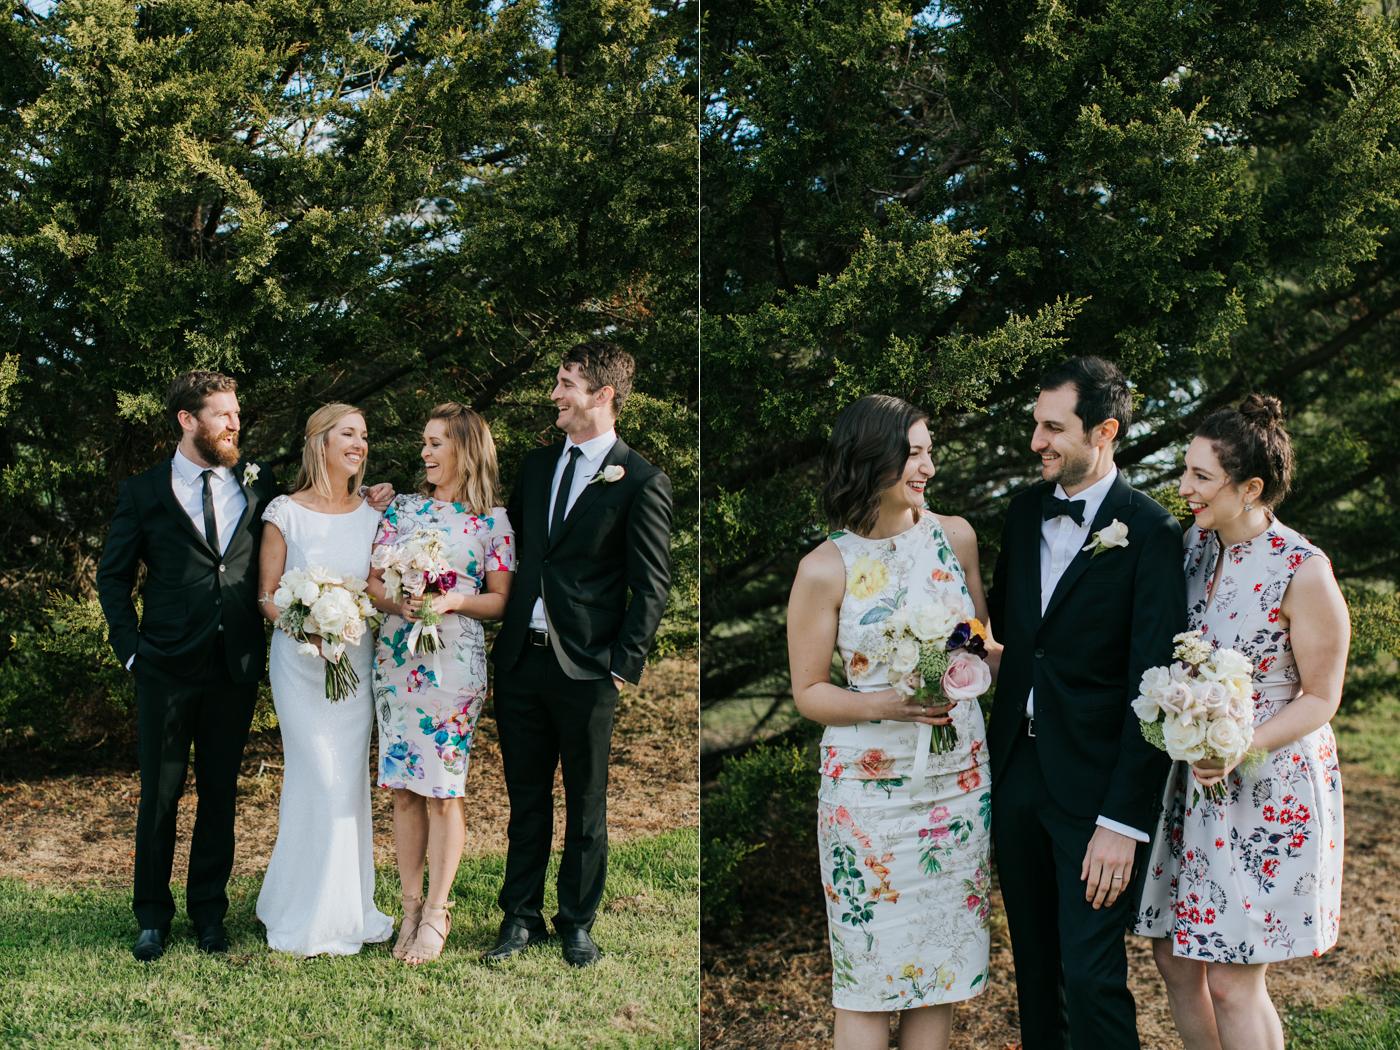 Bridget & James - Orange Country Wedding - Samantha Heather Photography-104.jpg